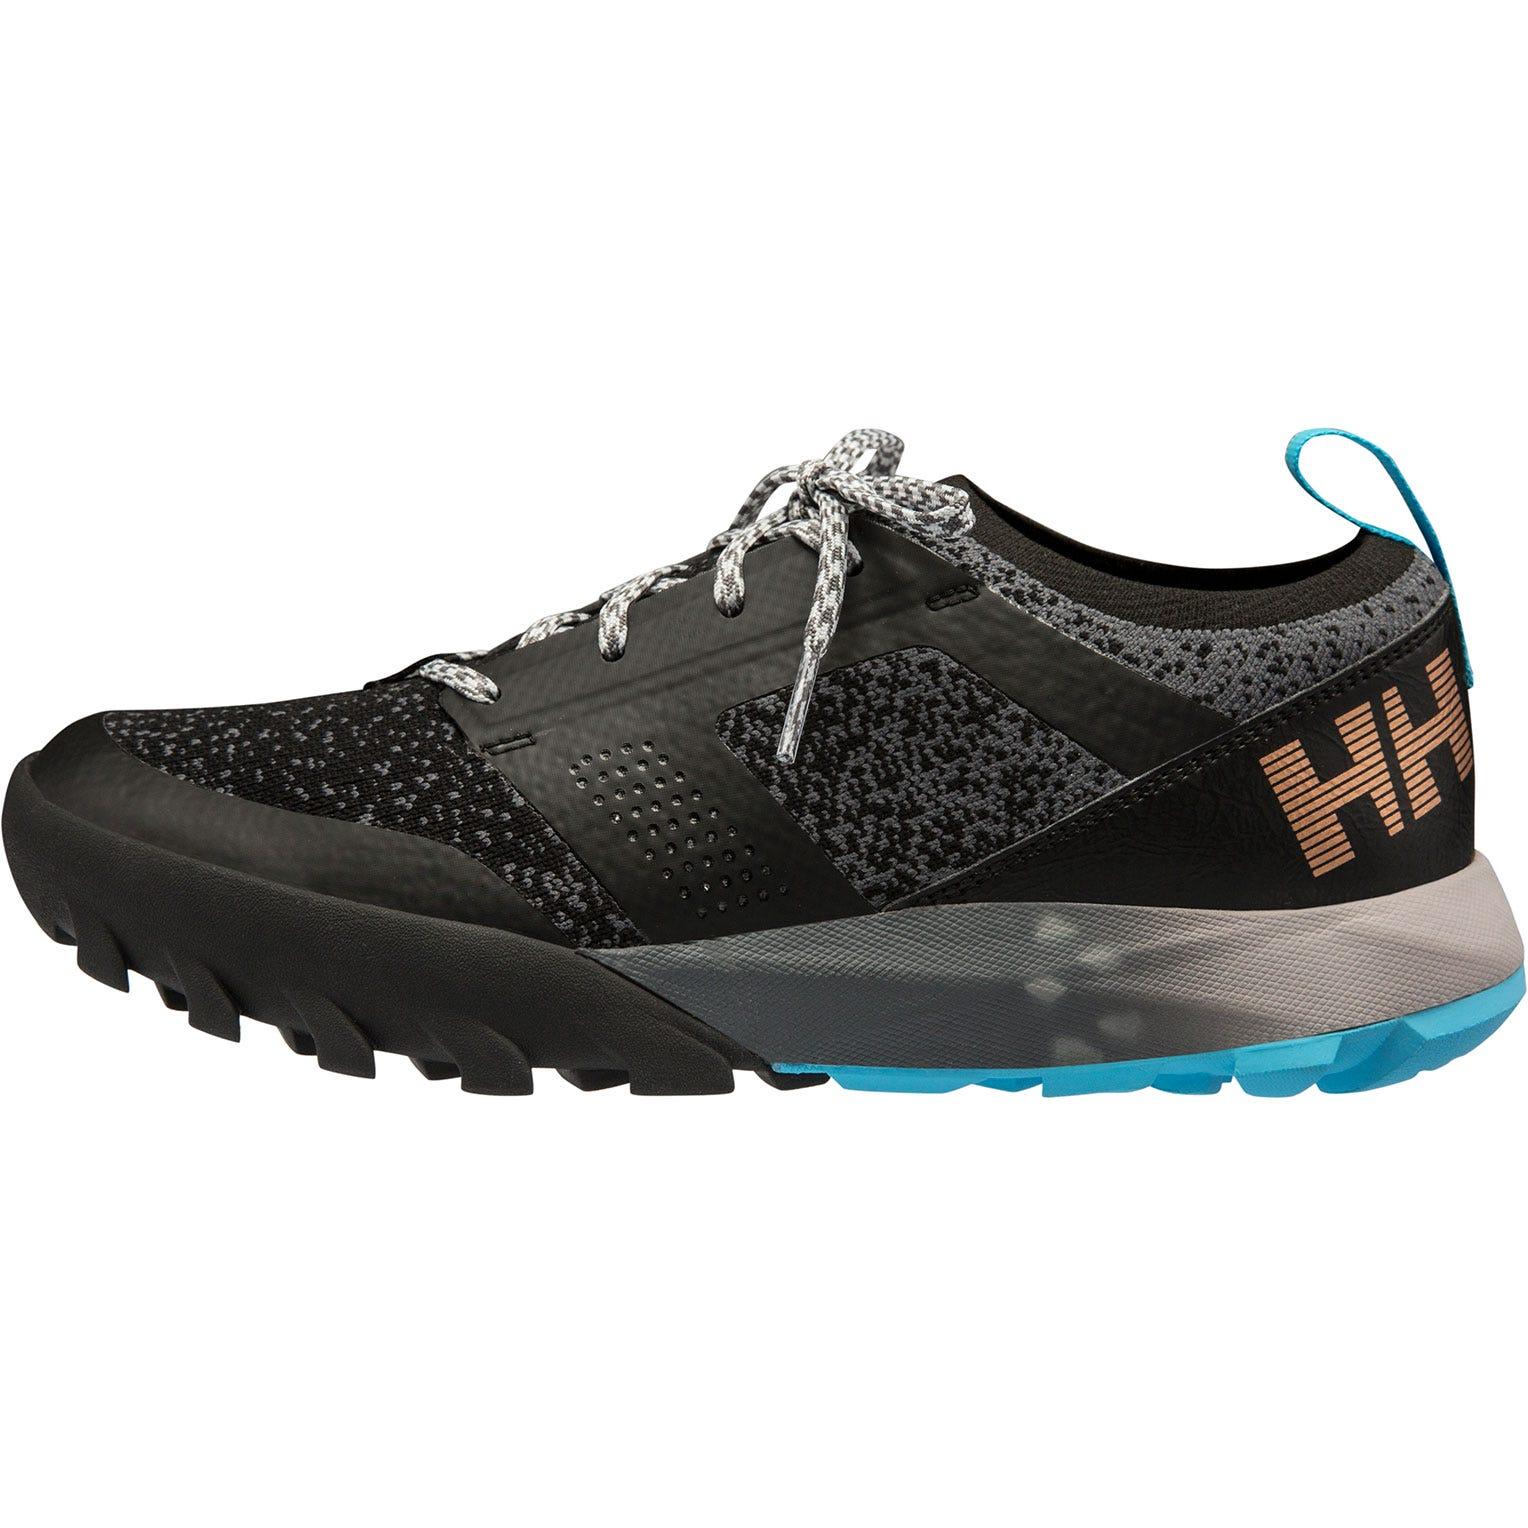 Helly Hansen W Loke Dash Womens Hiking Boot Black 40.5/9